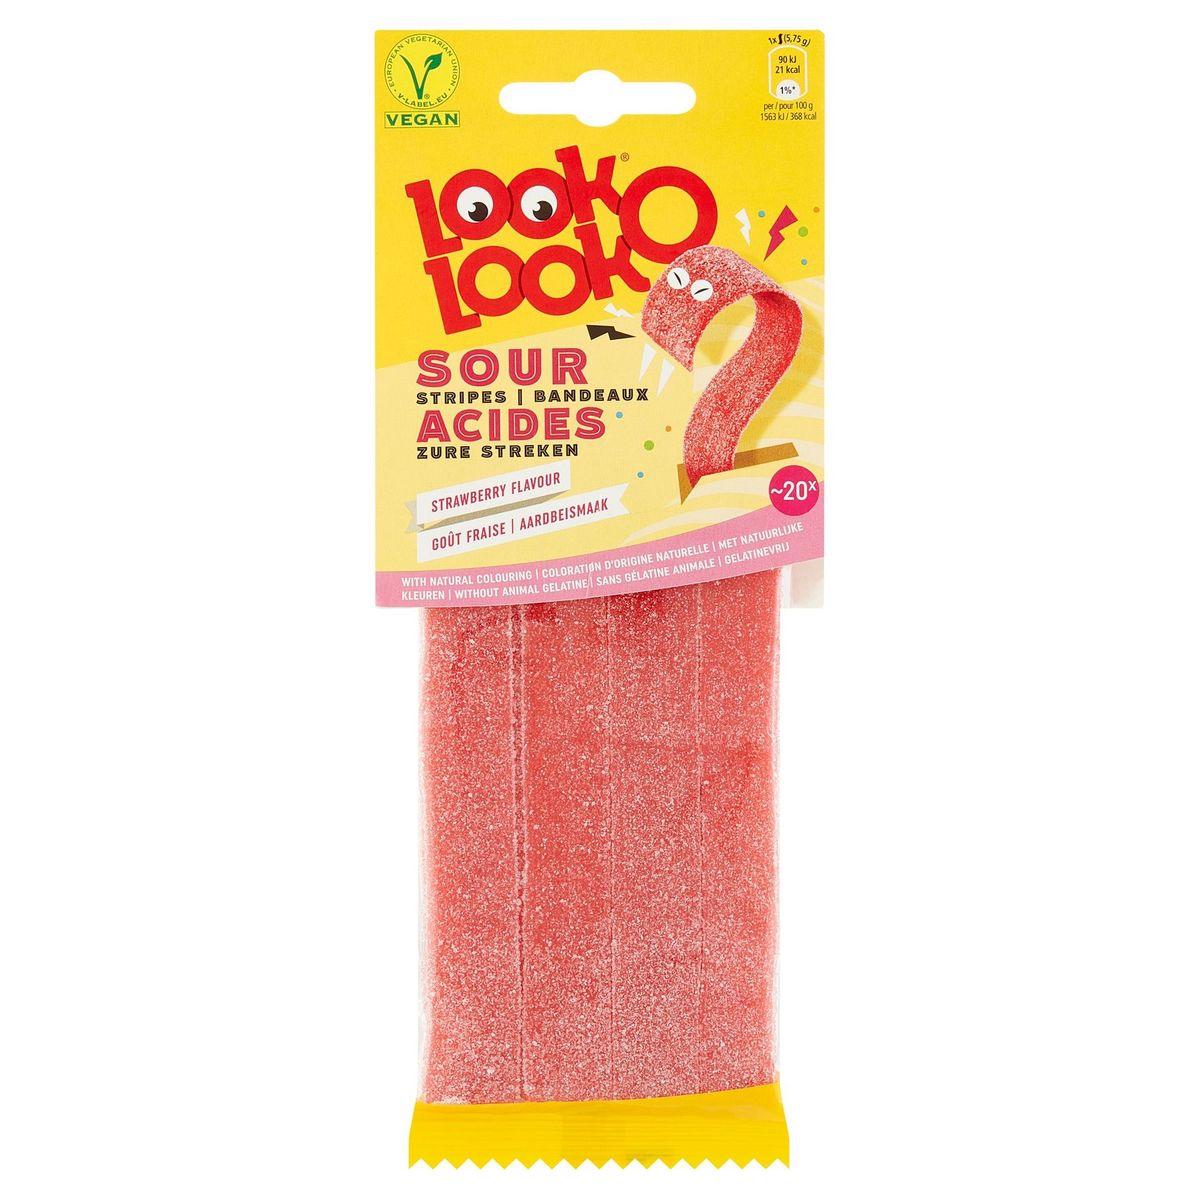 Look-O-Look Acides Bandeaux Goût Fraise 115 g